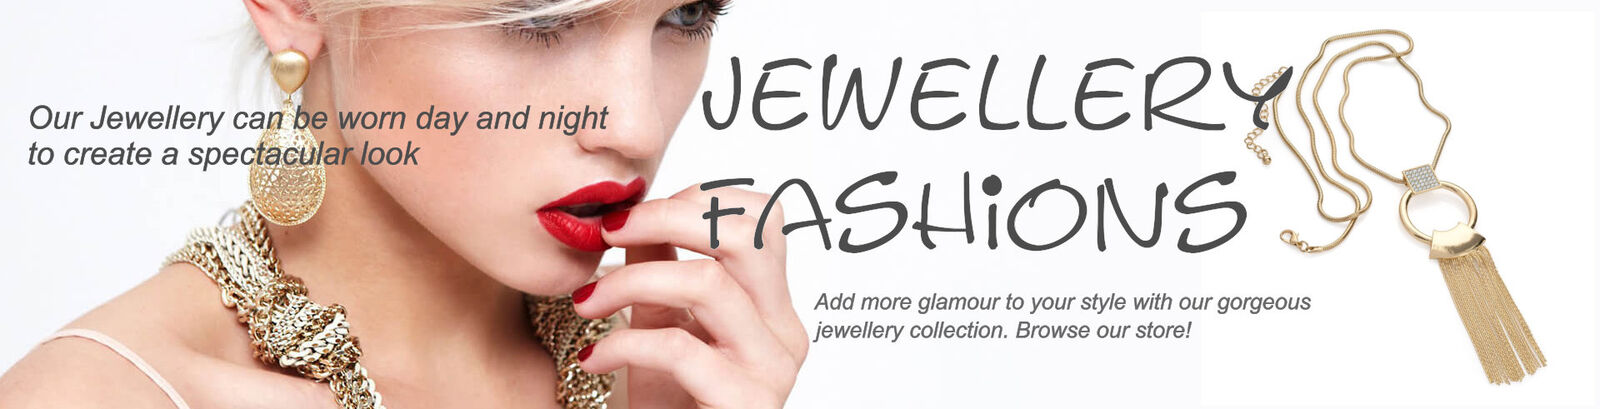 Jewellery Fashions